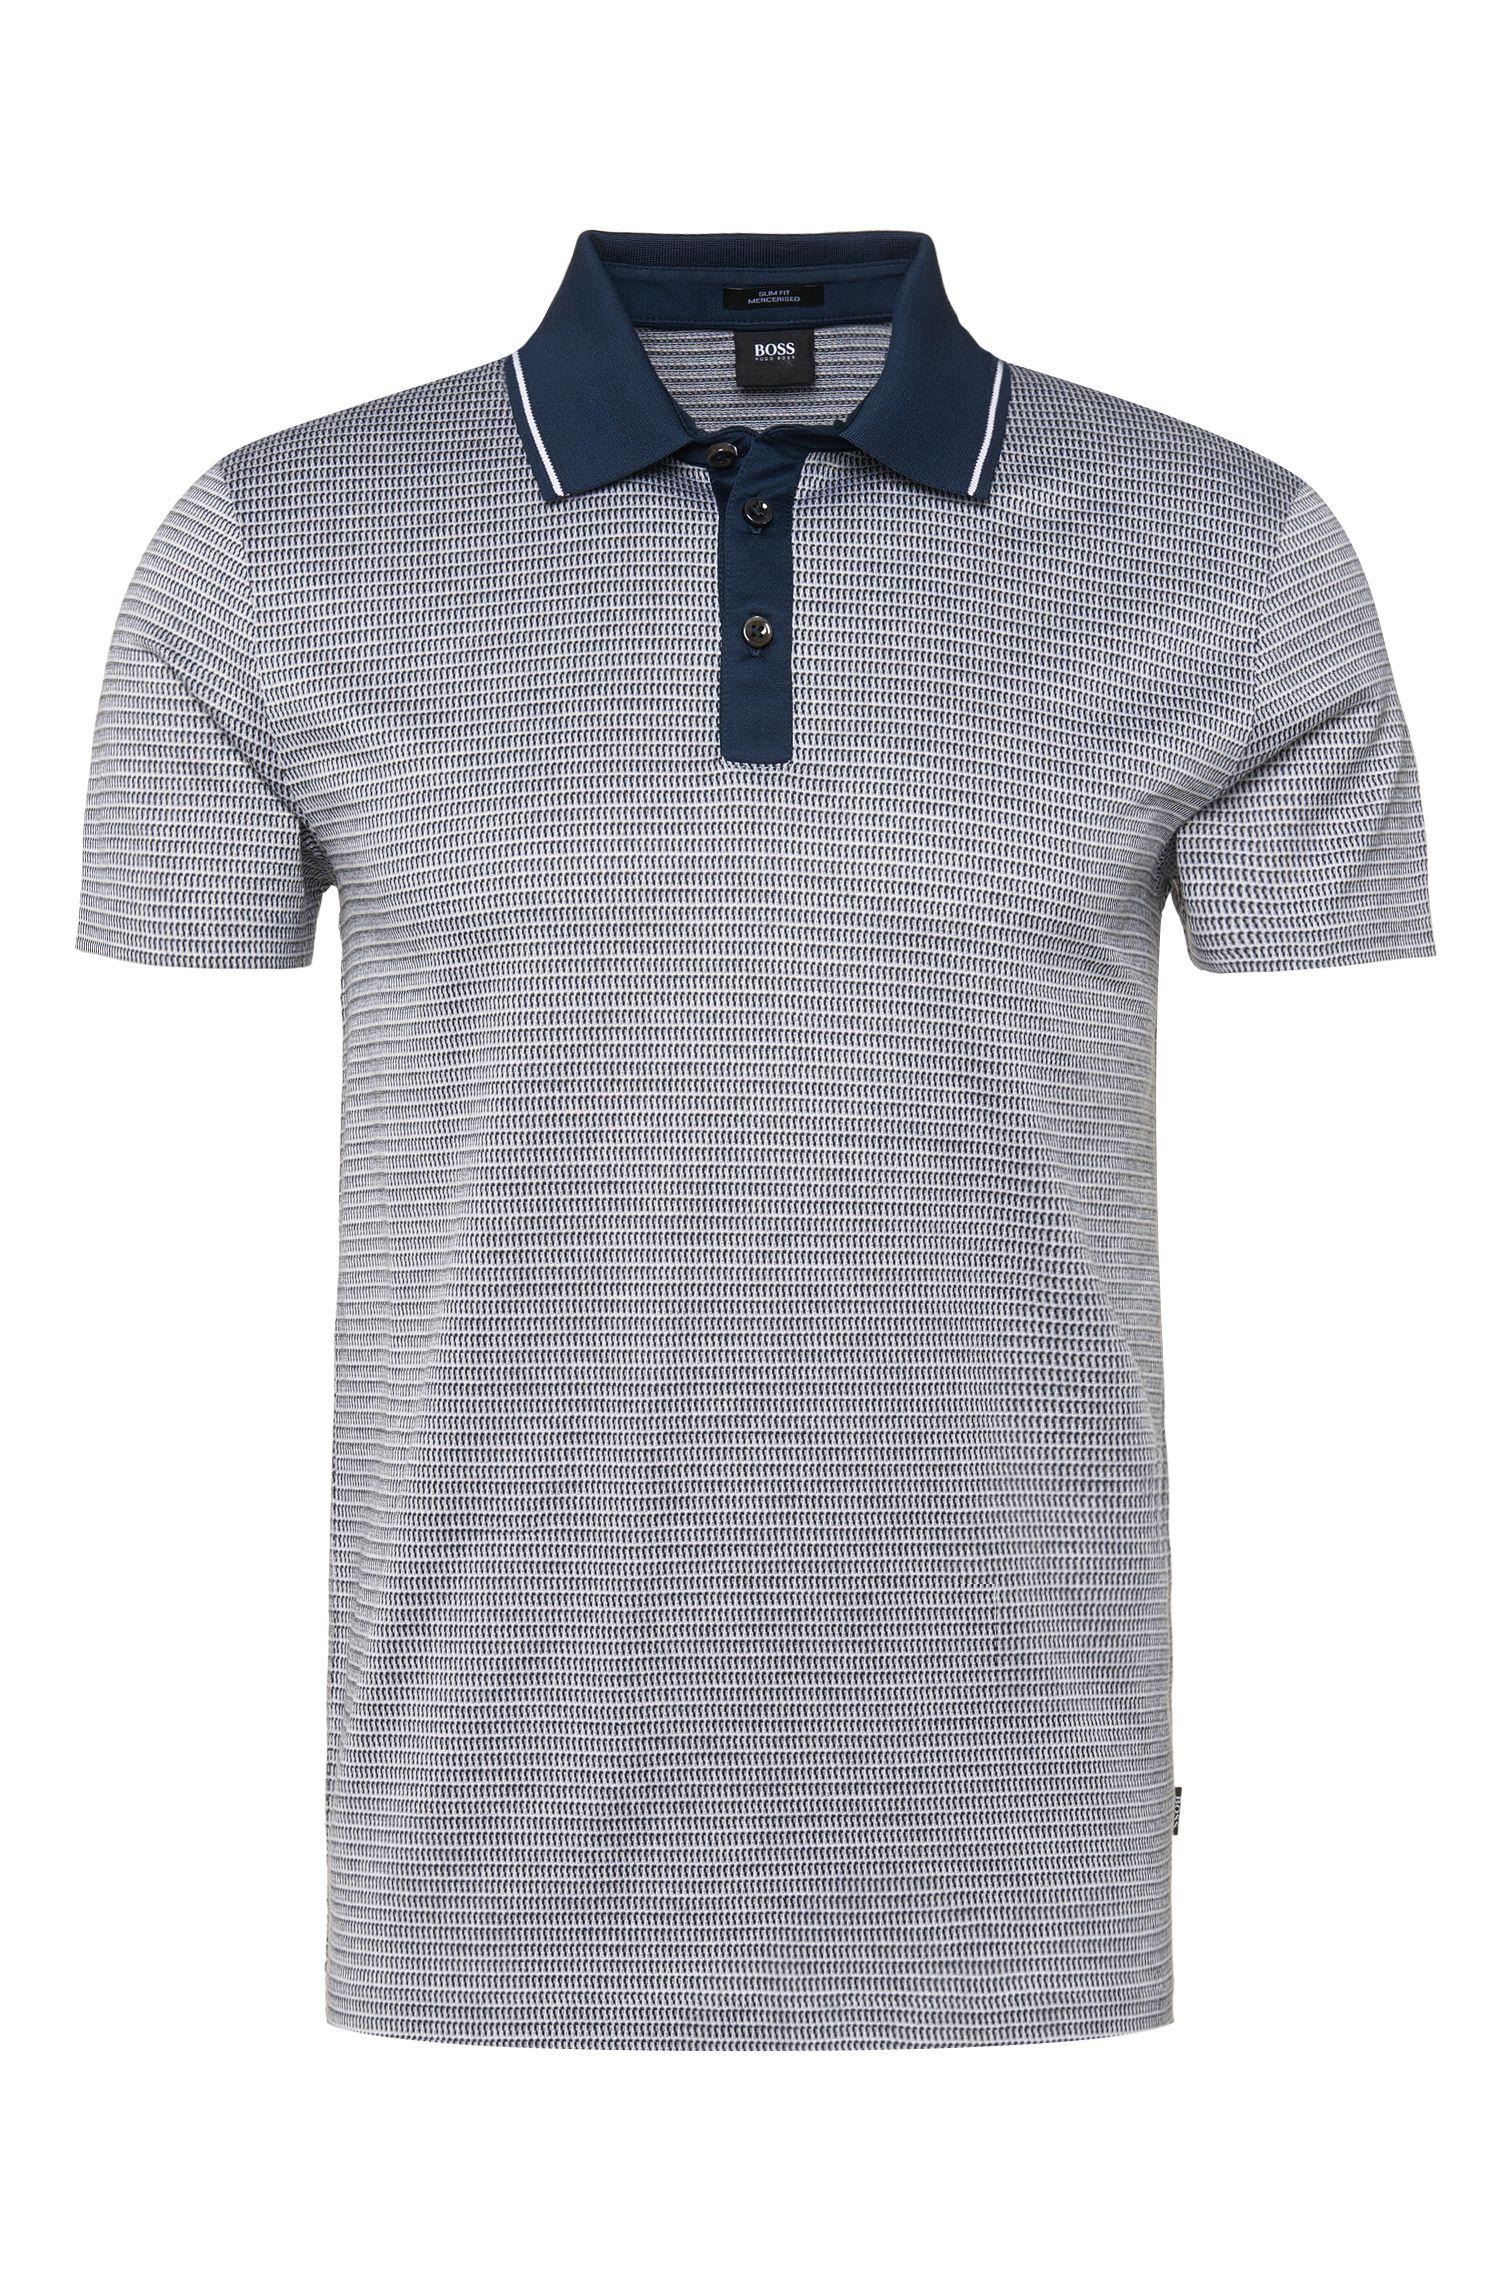 'Pitton' | Slim Fit, Mercerized Cotton Polo Shirt